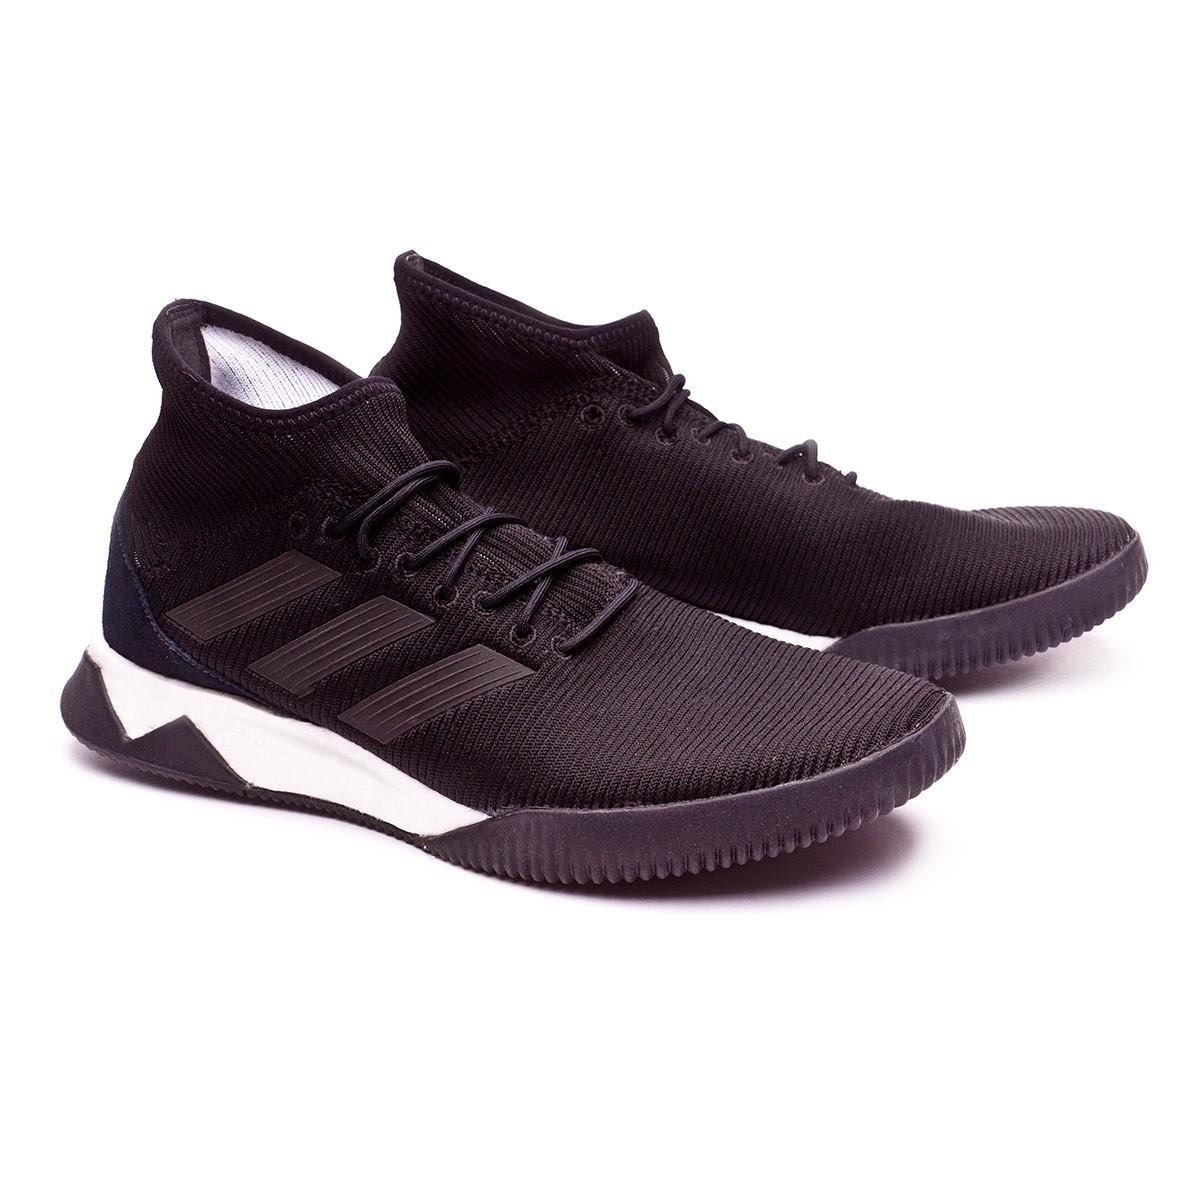 84a3079394fa Trainers adidas Predator Tango 18.1 TR Core black-White - Football ...